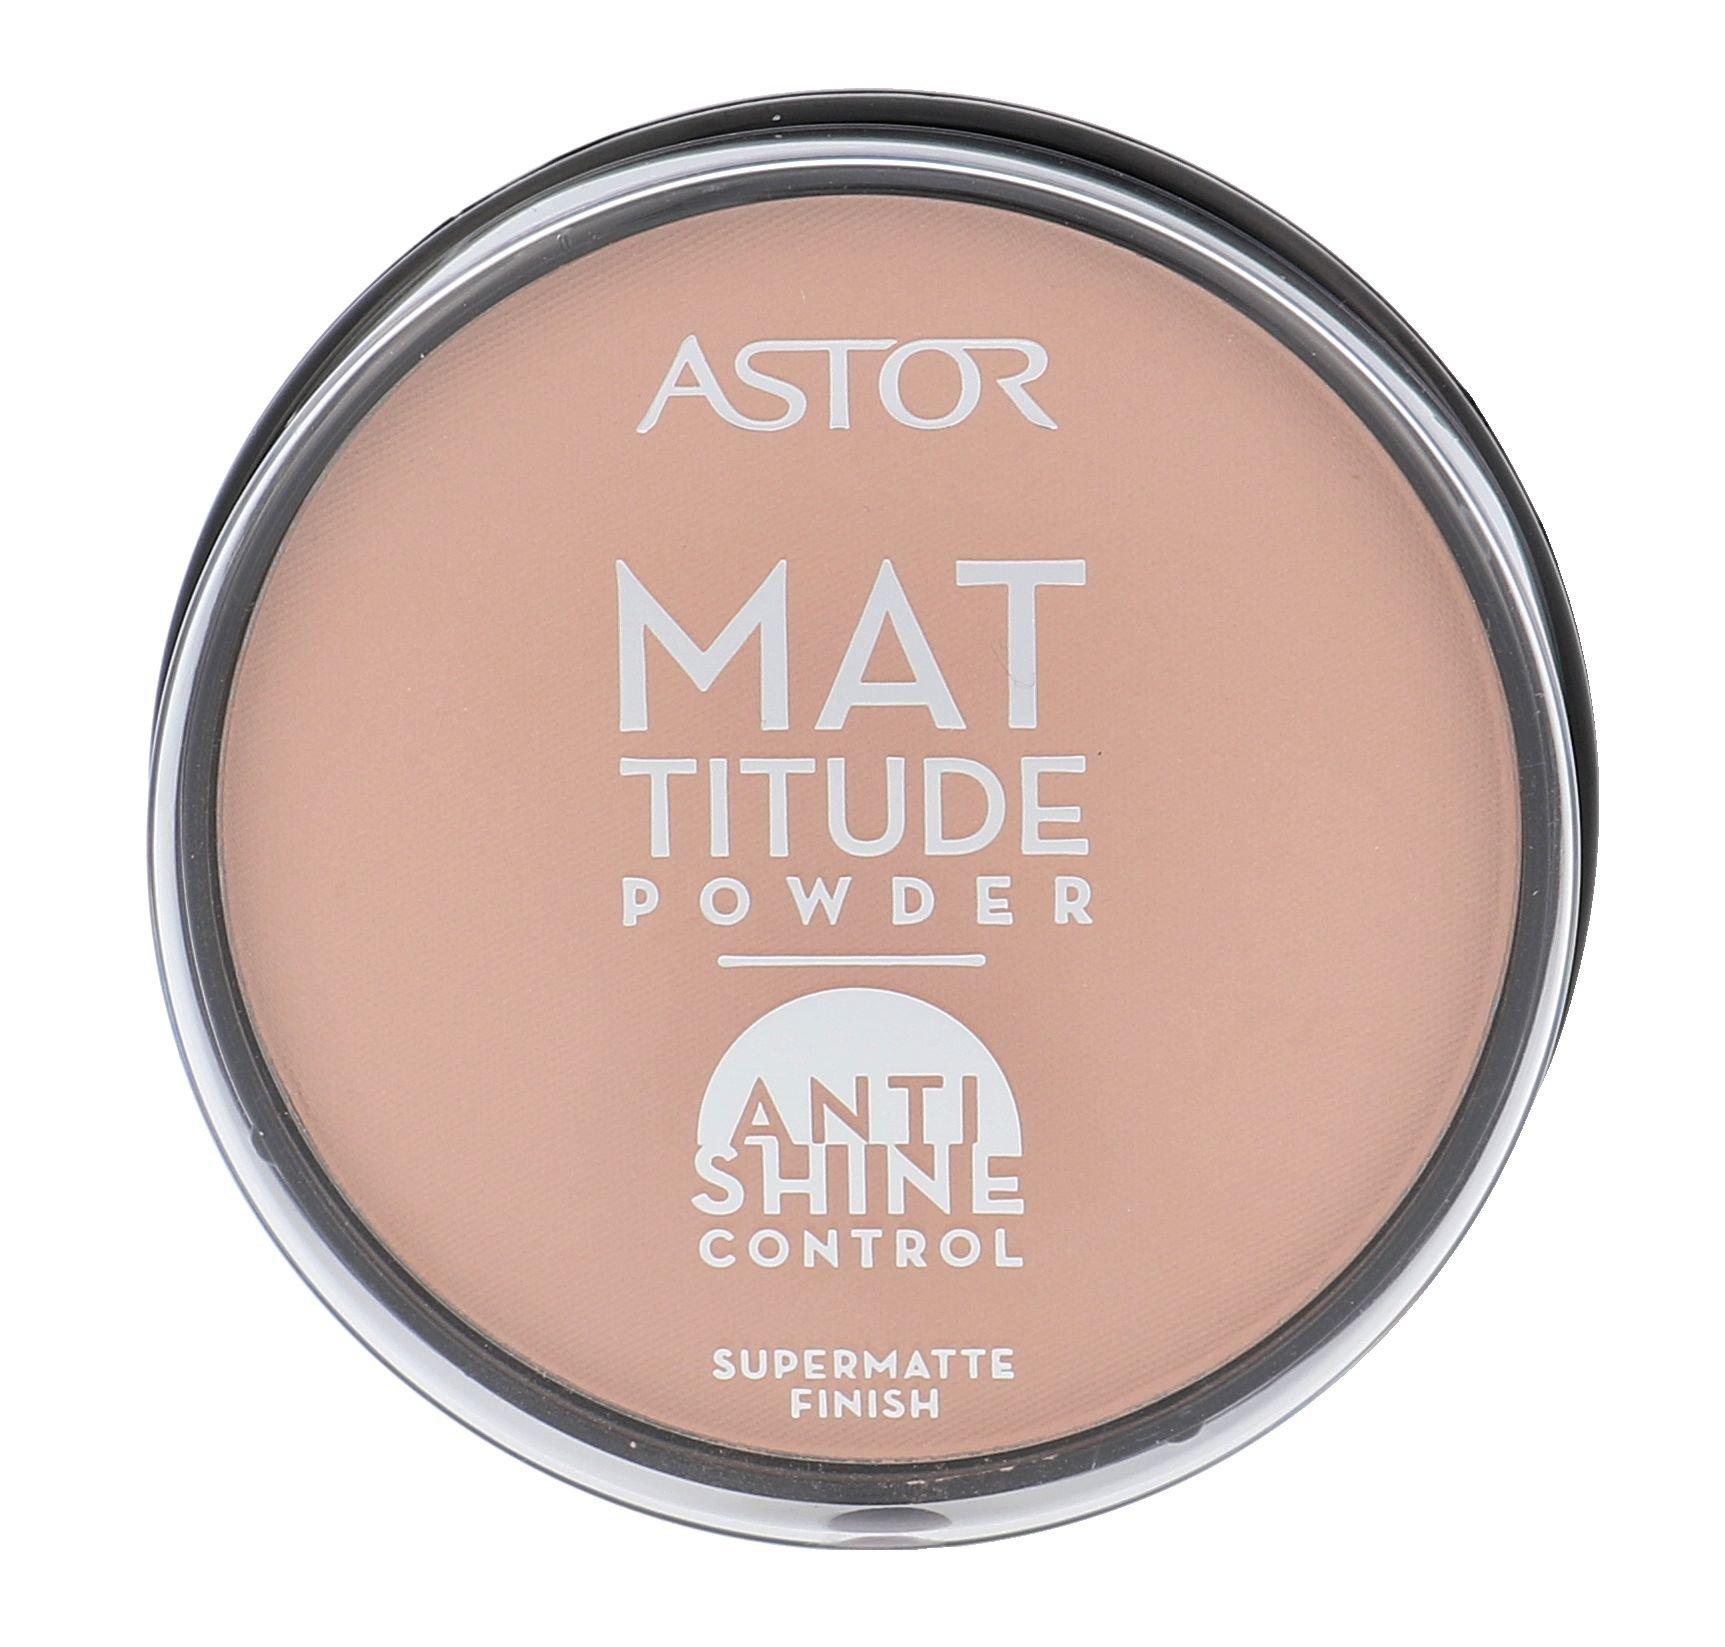 ASTOR Mattitude Cosmetic 14ml 004